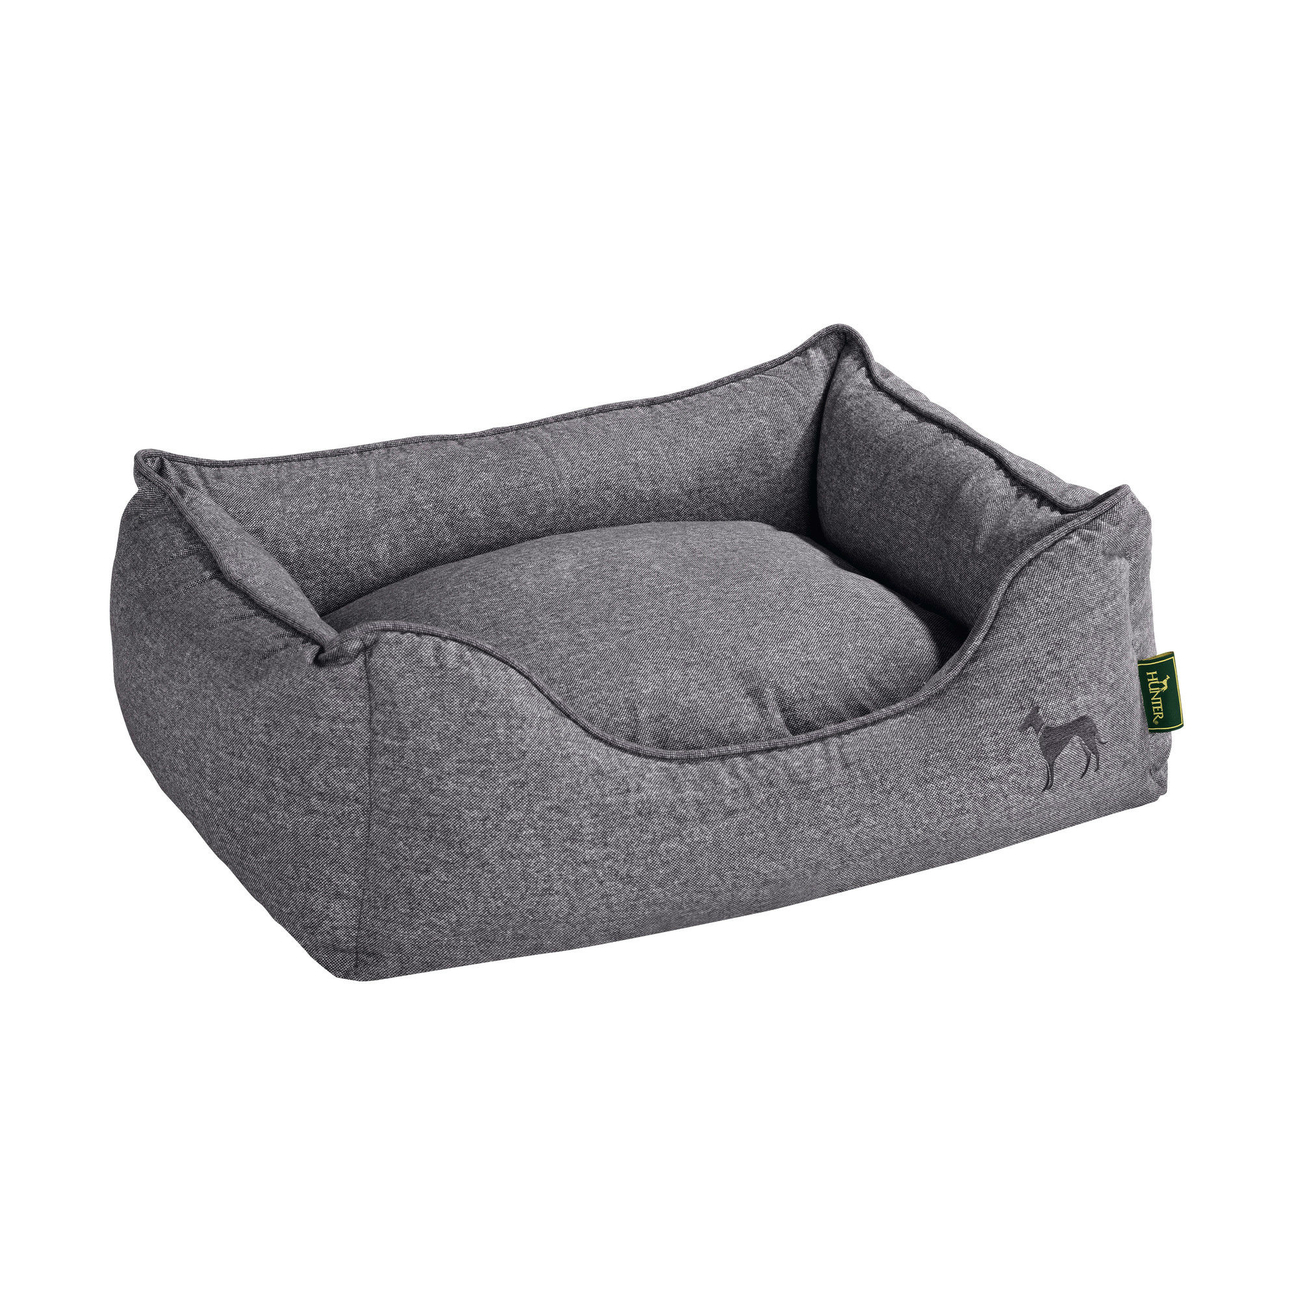 hunter hundesofa hundebett boston microfaser 61429 von. Black Bedroom Furniture Sets. Home Design Ideas